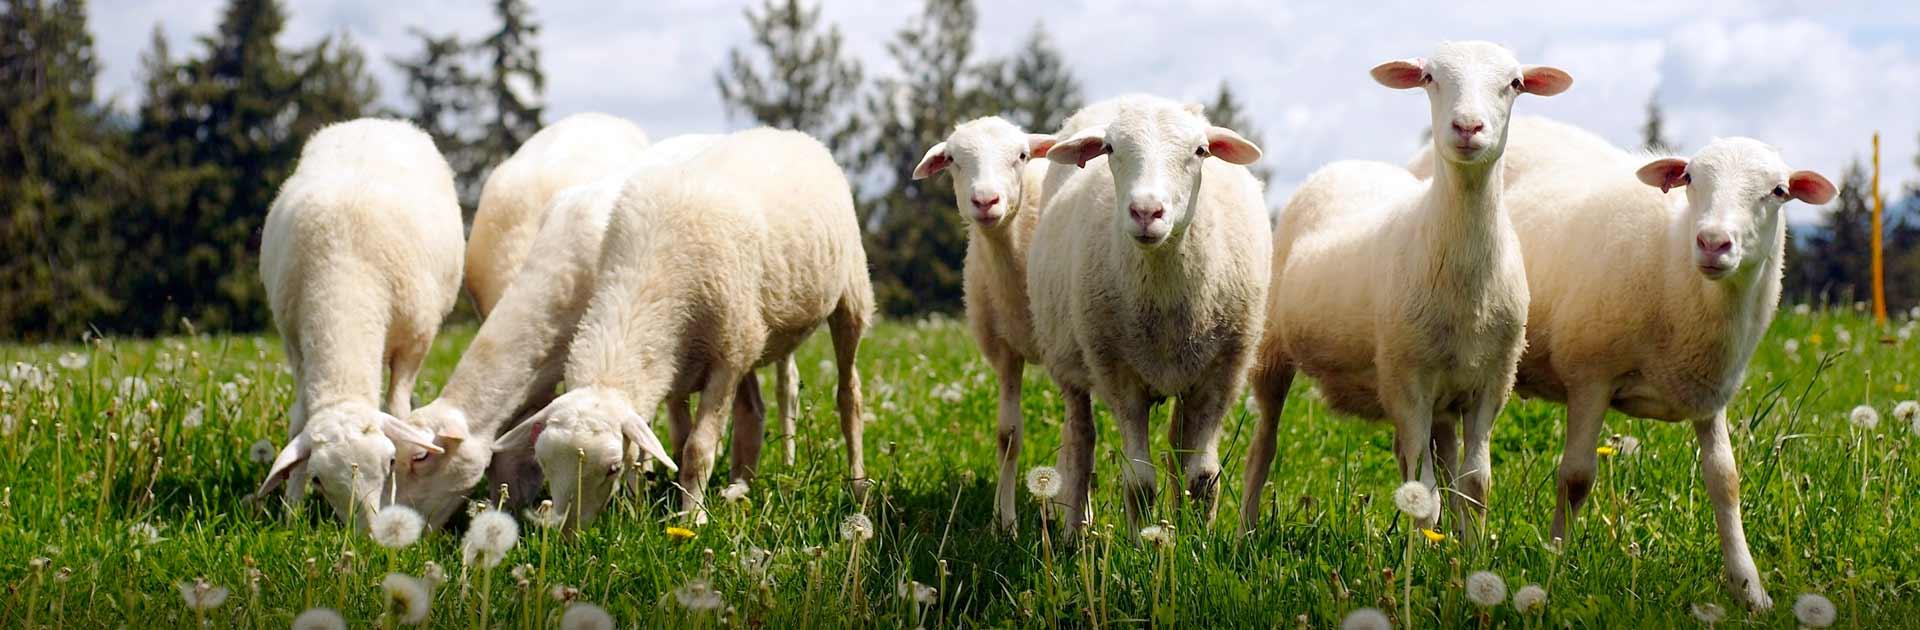 beeffarm Agrotrainee - Ukrainian agro practicants in Europe